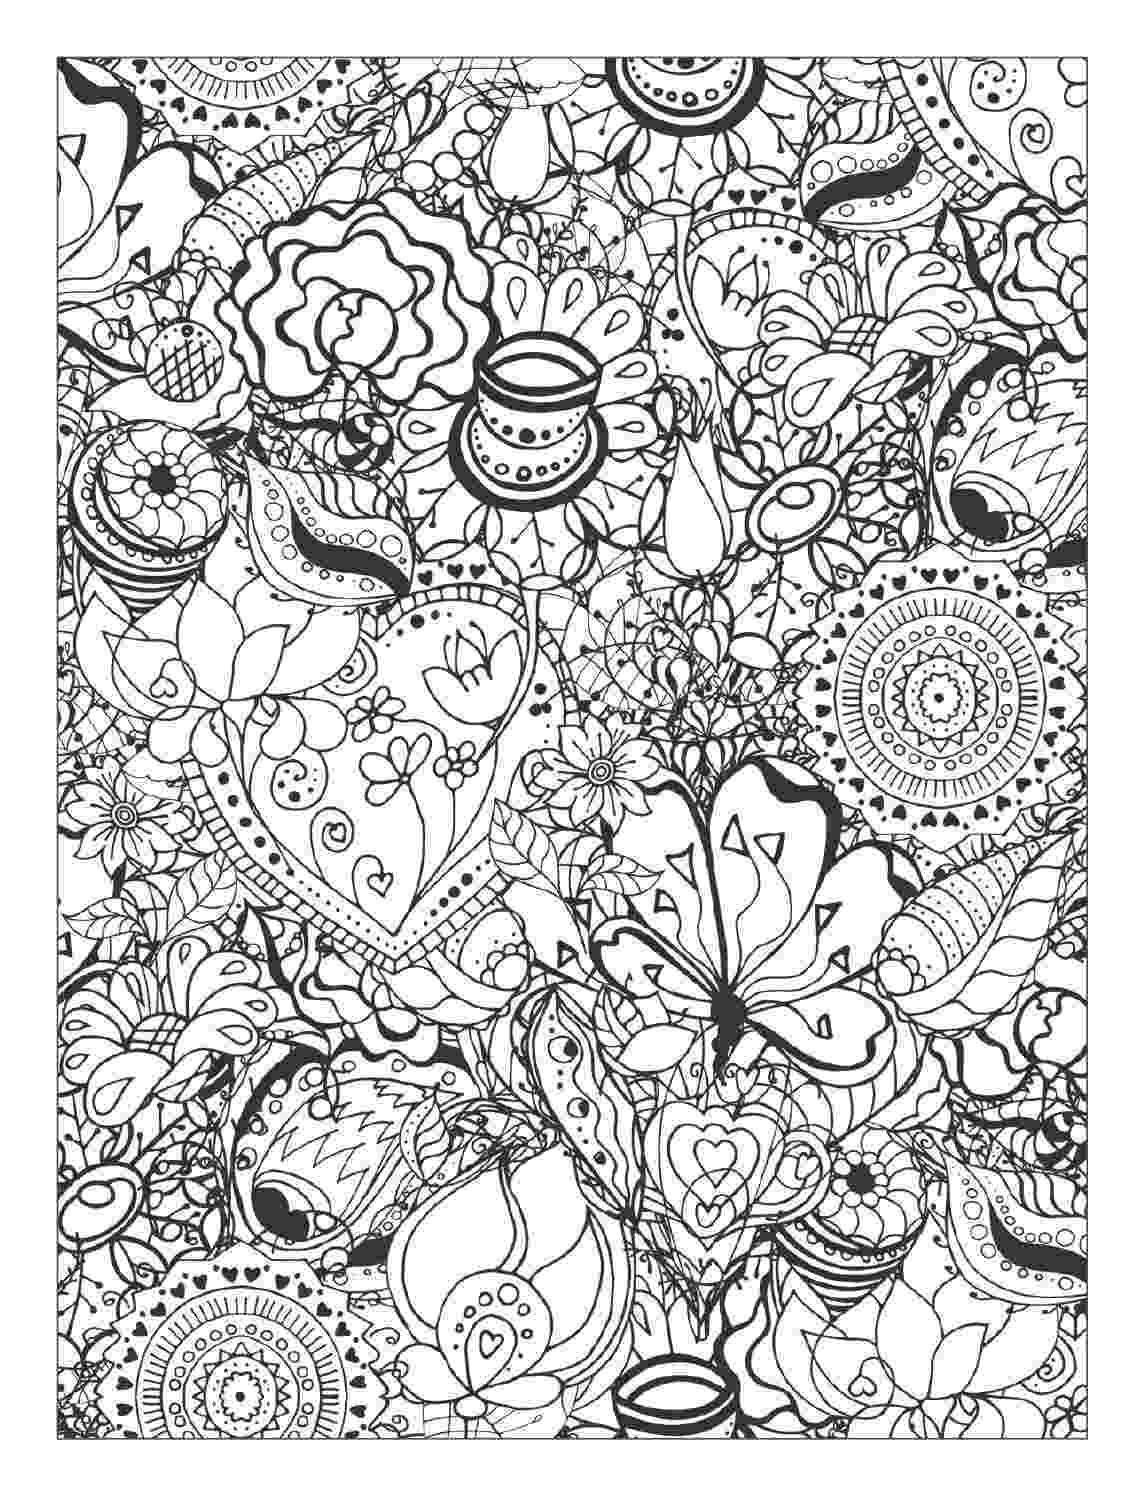 floral designs coloring book beautiful flowers detailed floral designs coloring book coloring floral designs book 1 2